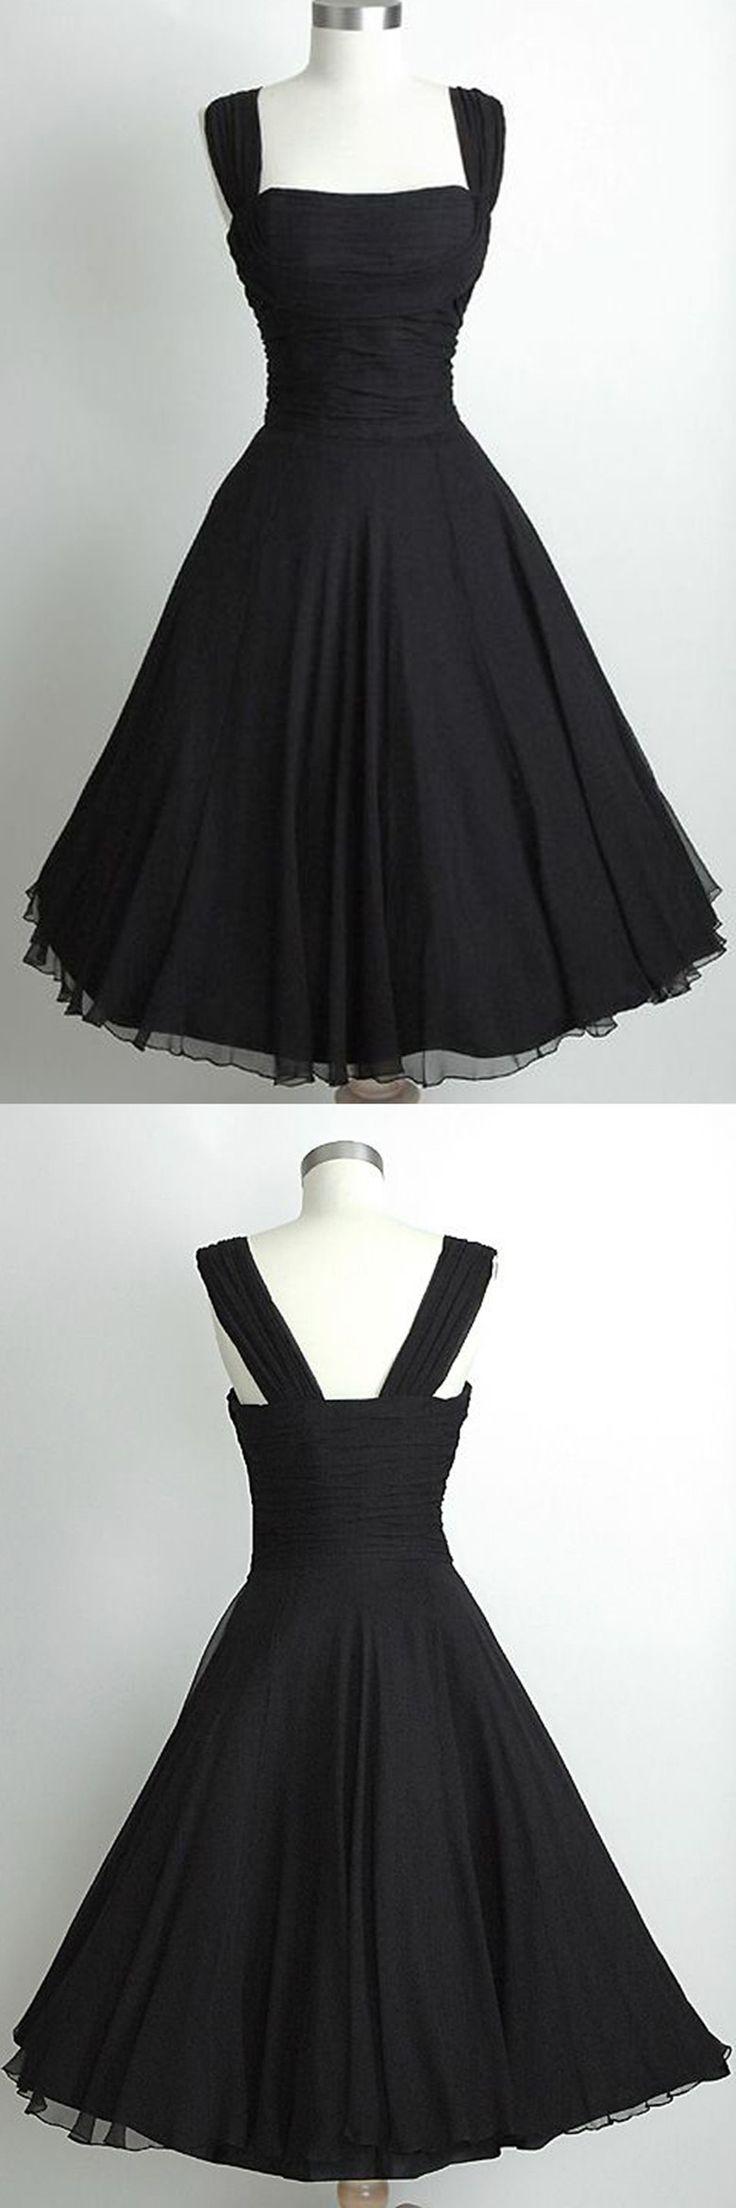 homeoming dress,black homecoming dress,vintage homecoming dress,tea length homecoming dress,a-line homeoming dress